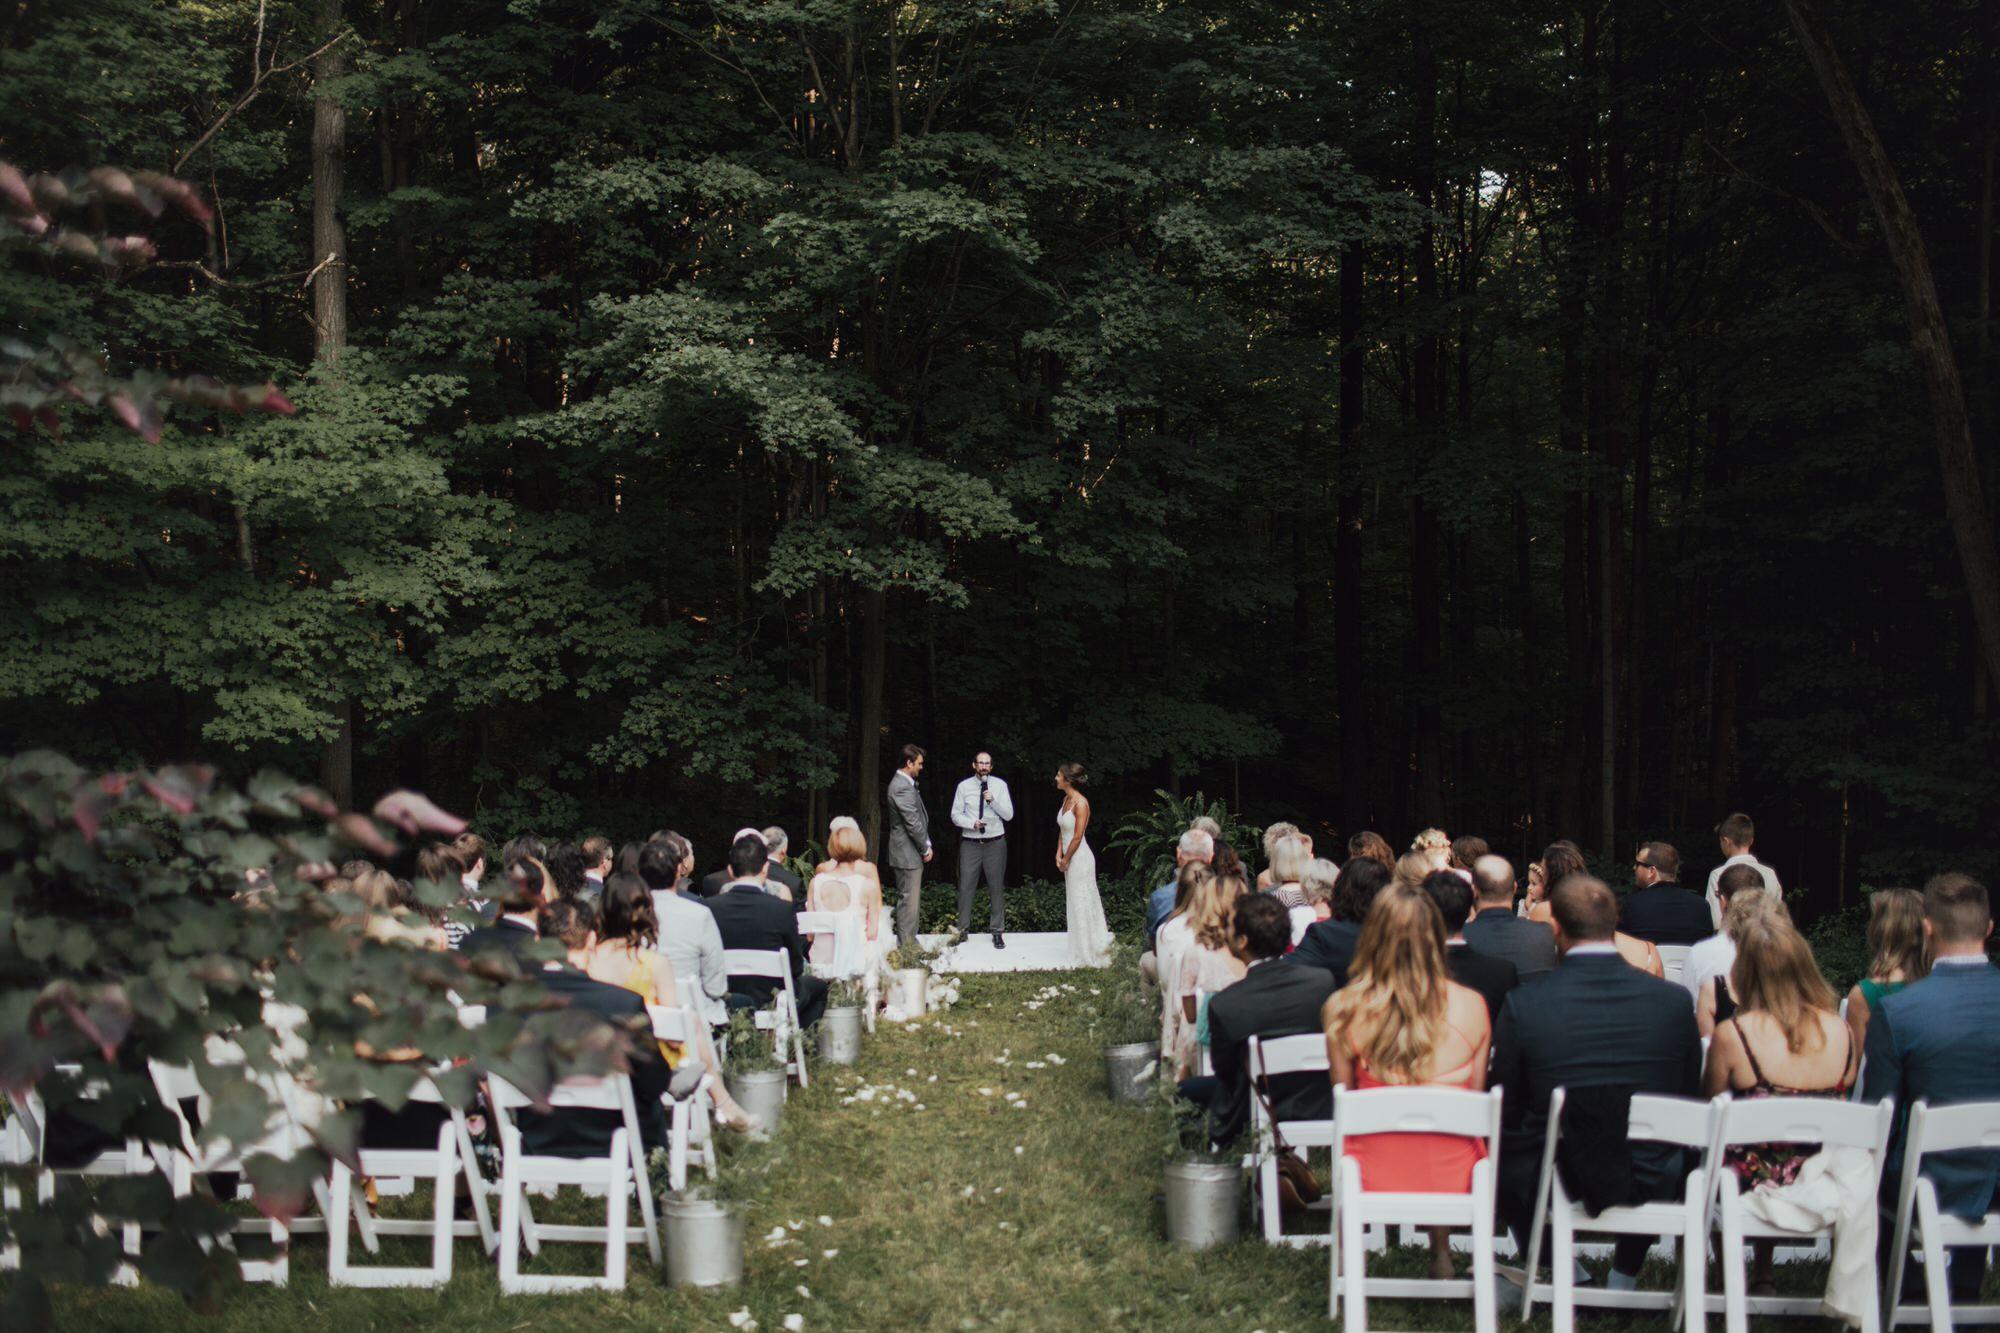 emily-aaron-rochester-new-york-wedding-photographer-65.JPG